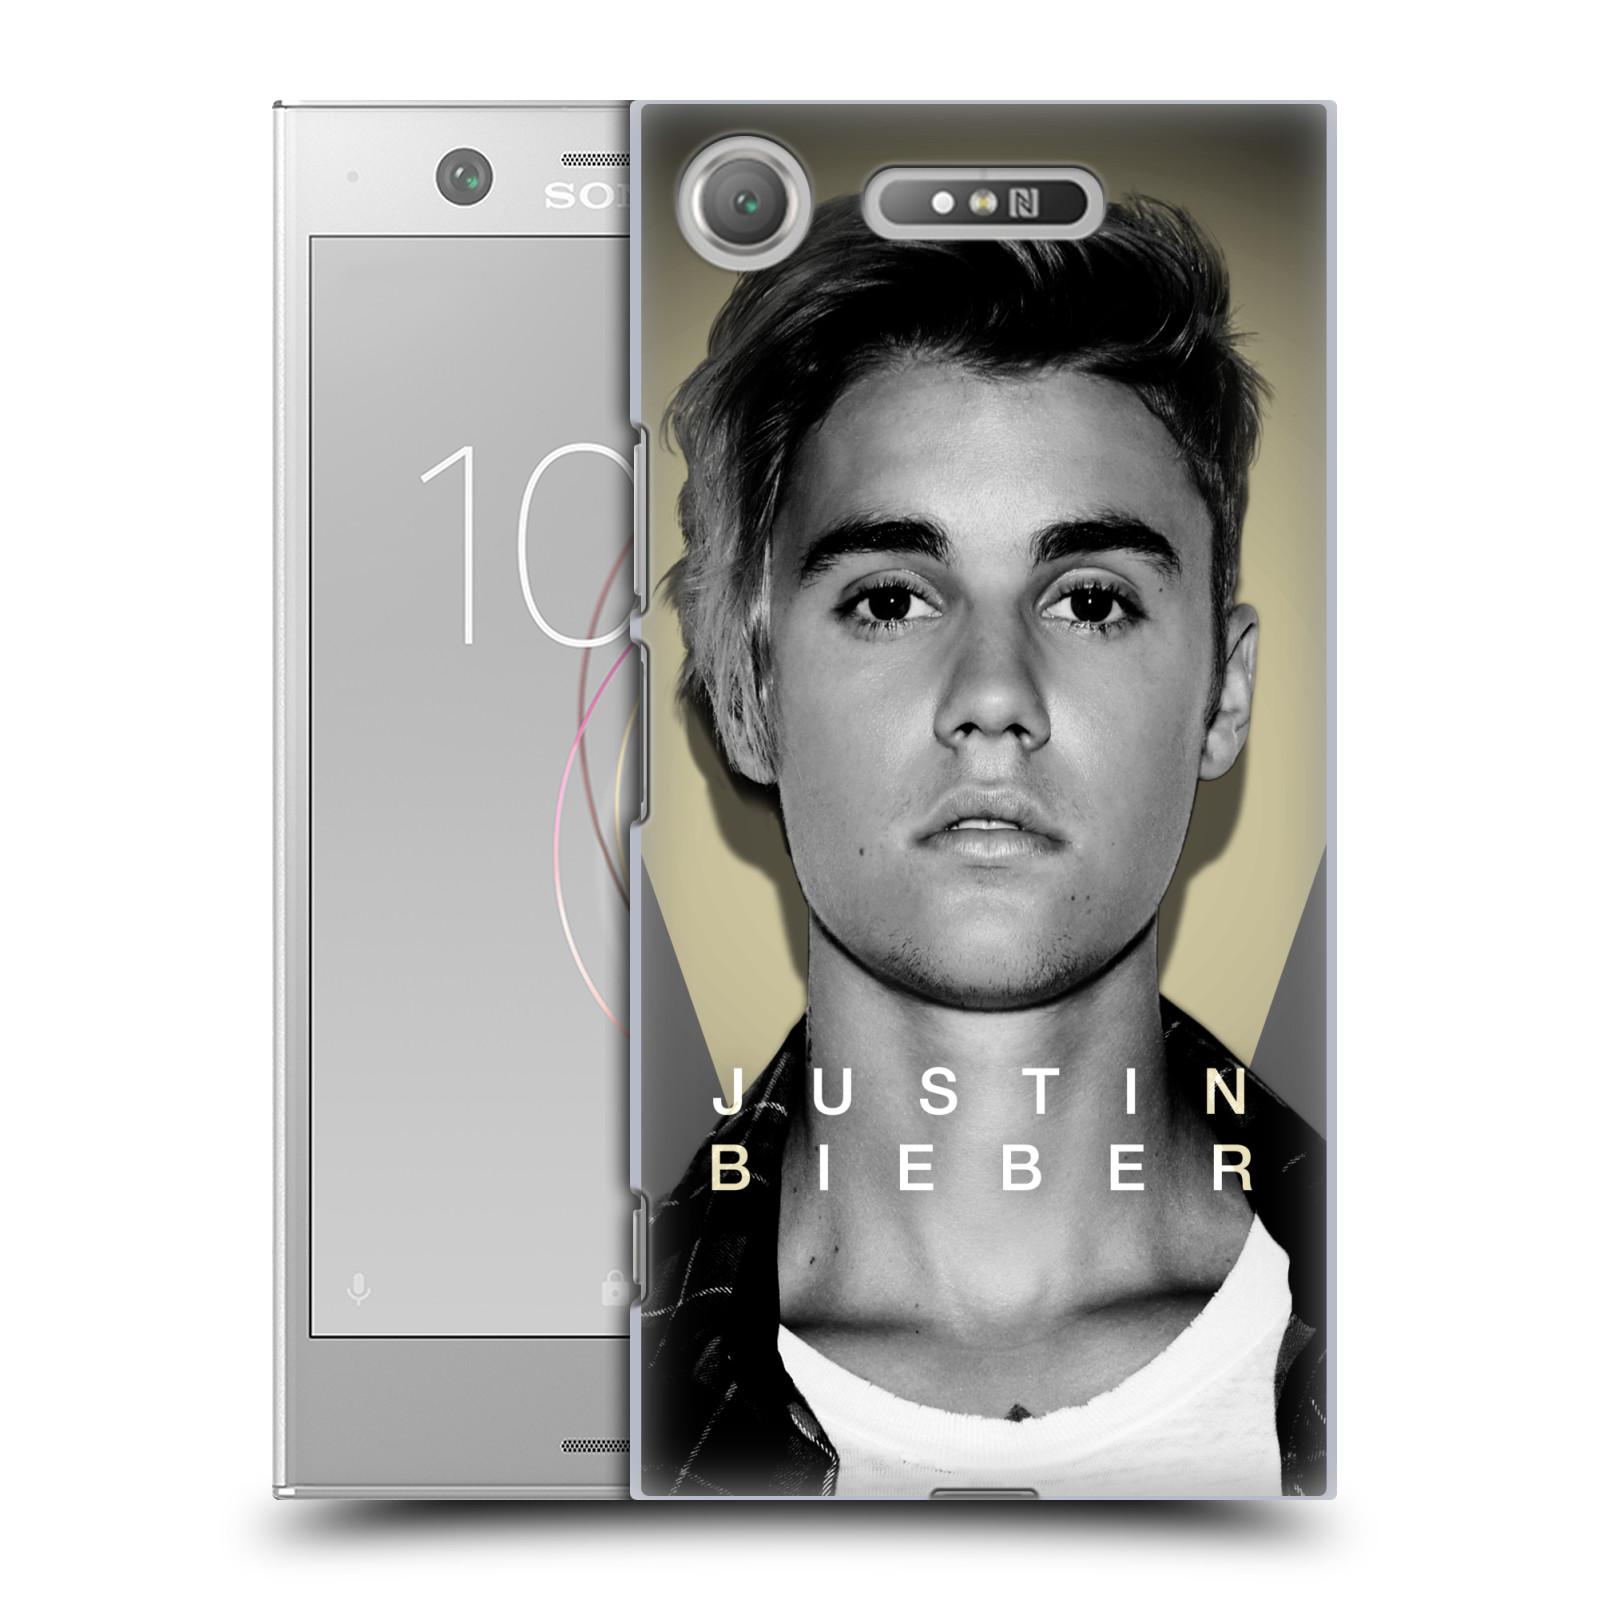 Plastové pouzdro na mobil Sony Xperia XZ1 - Head Case - Justin Bieber Official - Head Shot